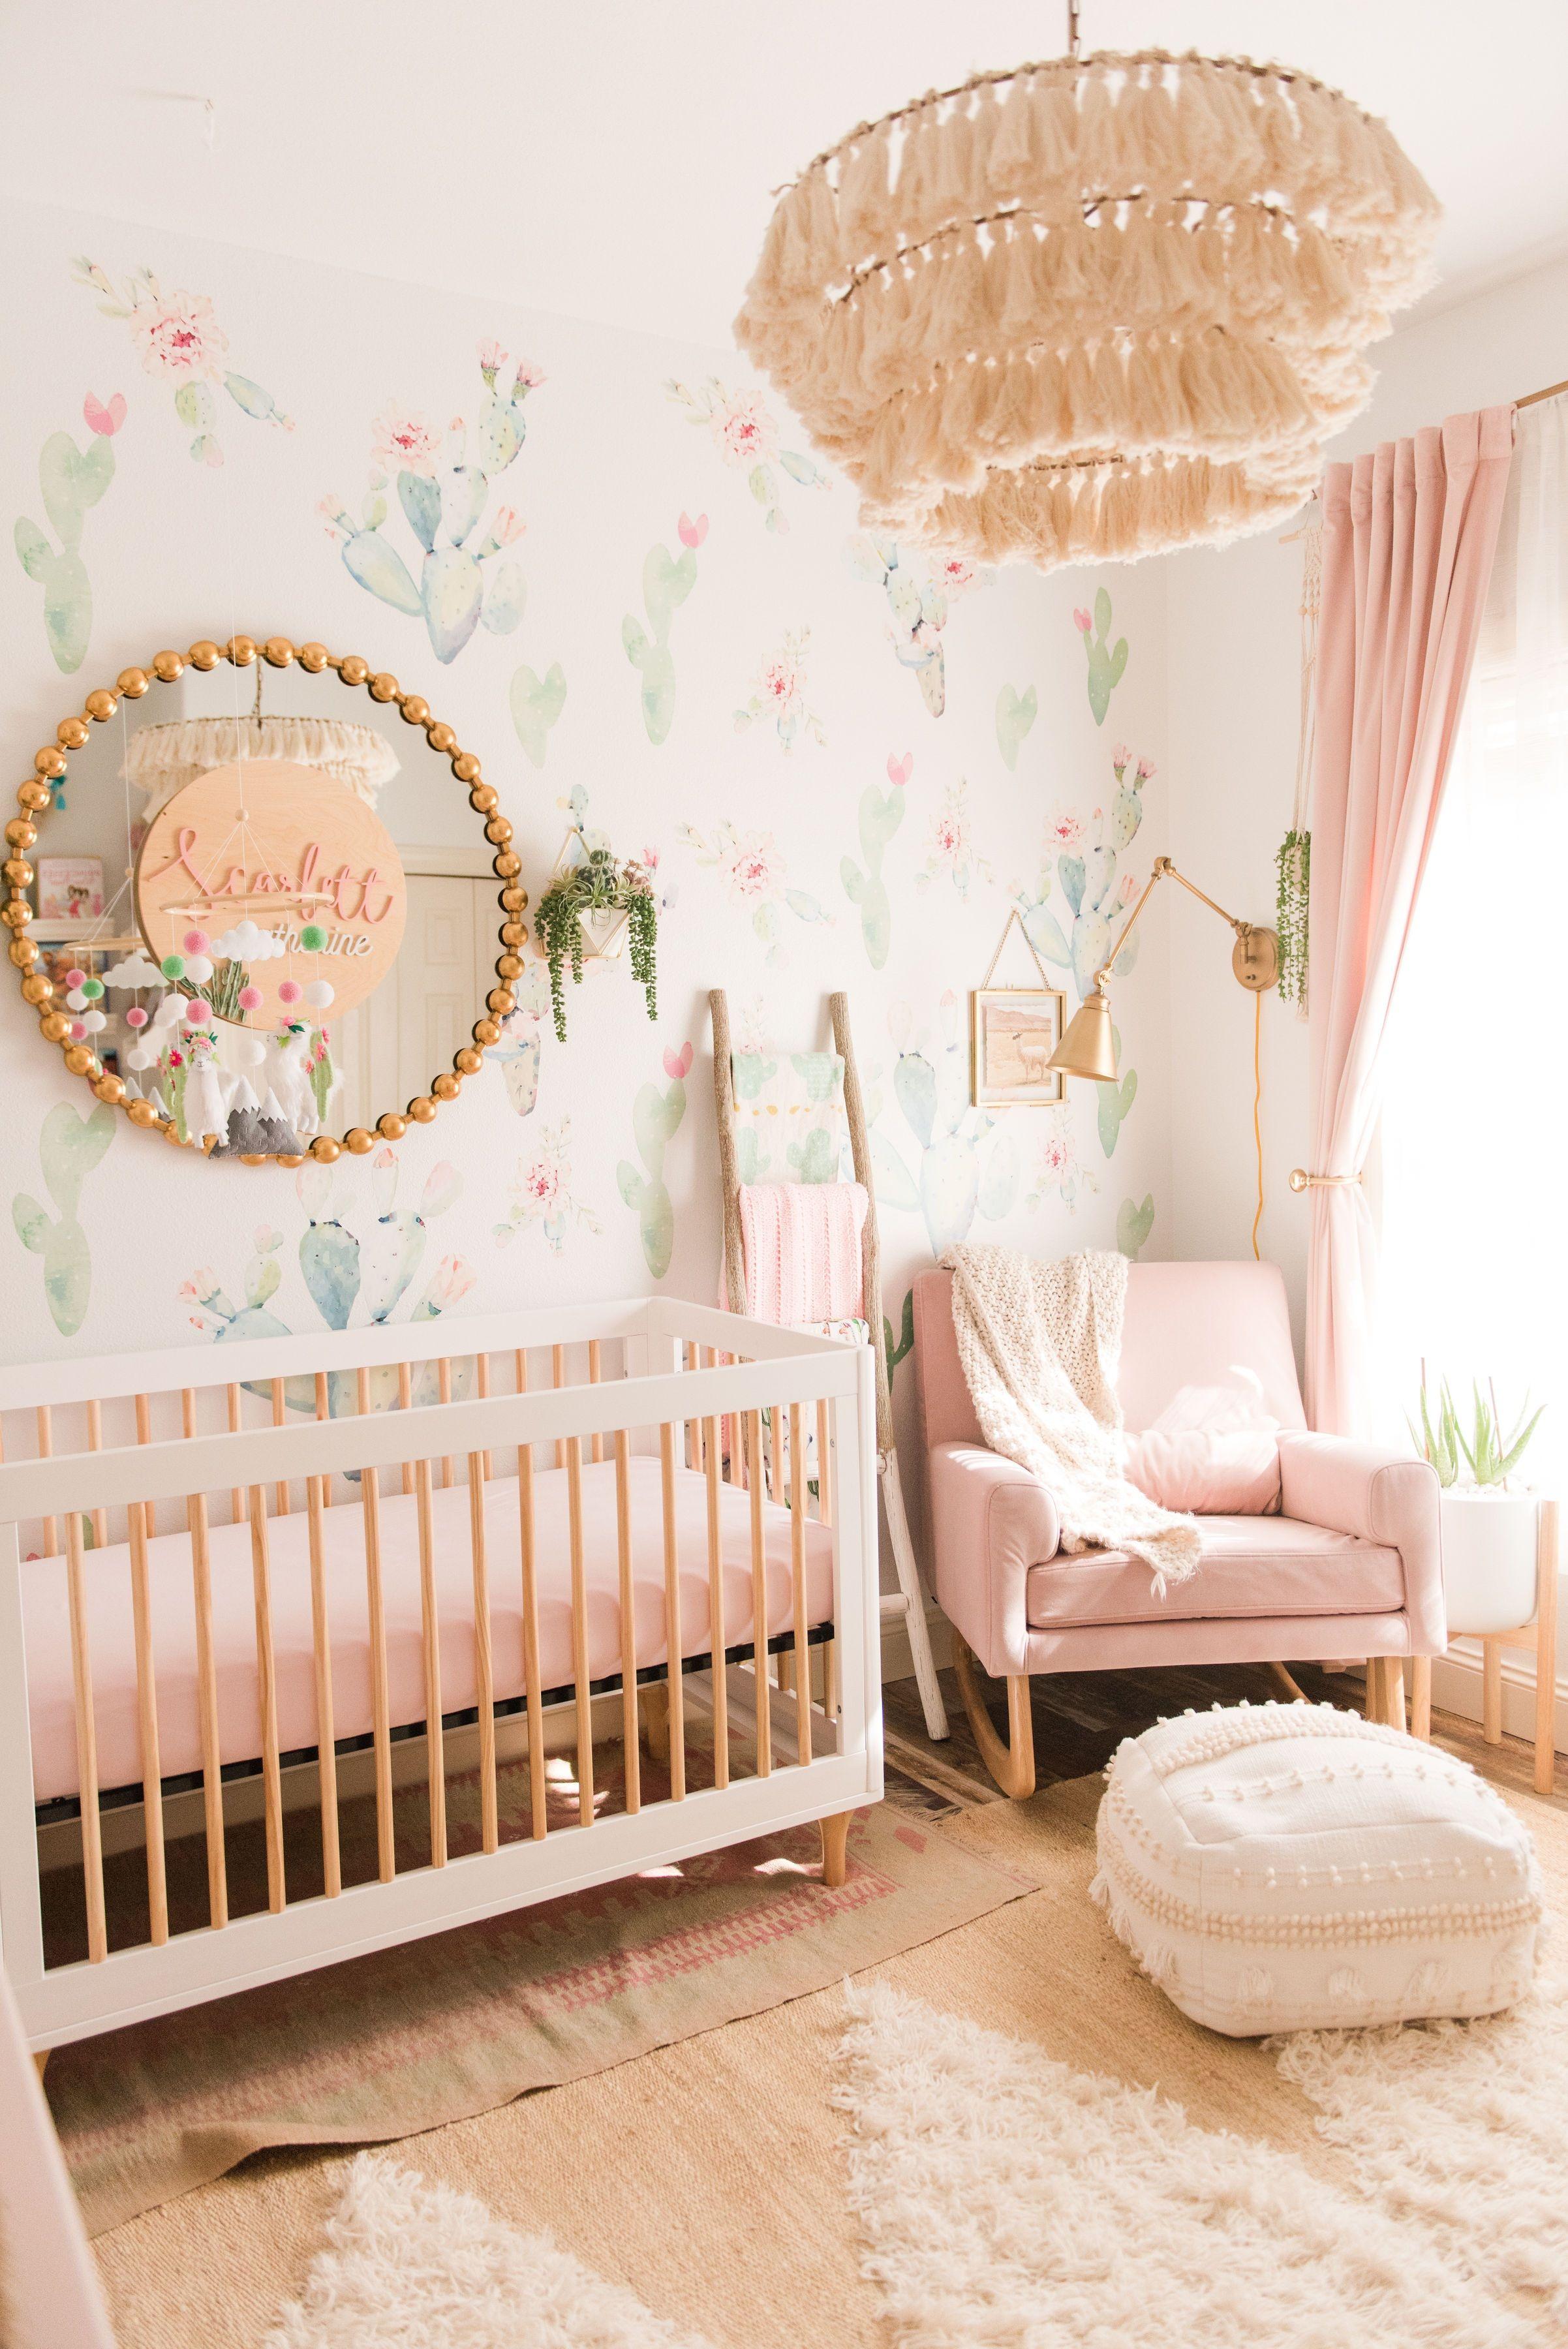 Full Cactus Nursery Reveal Girl Nursery Room Baby Nursery